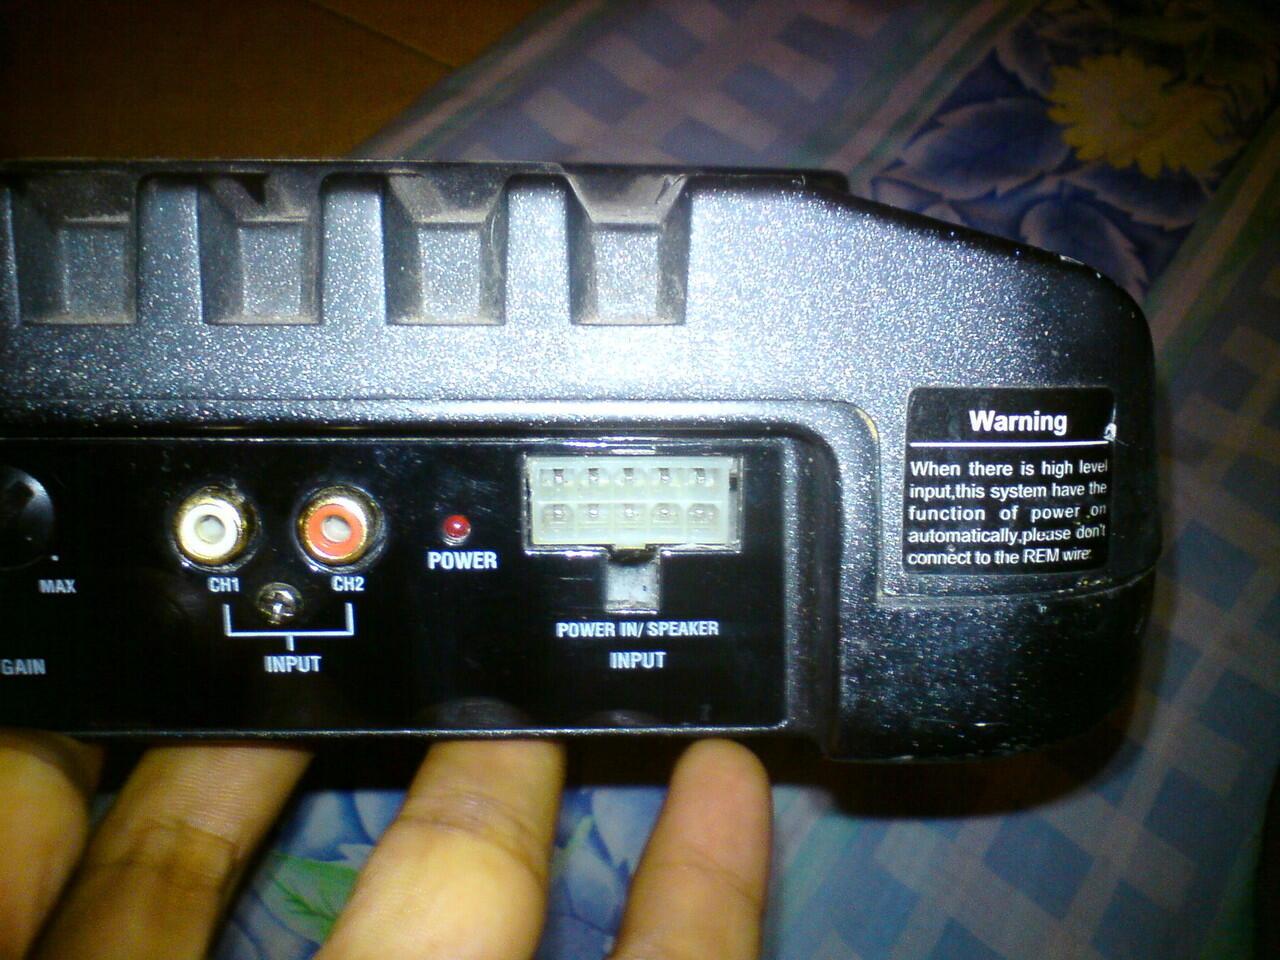 All About Diy Audio Speaker Amp Etc Page 127 Kaskus Making Home Theater 51 Surround Amplifier Gambar Skema Rangkaian Diskusi